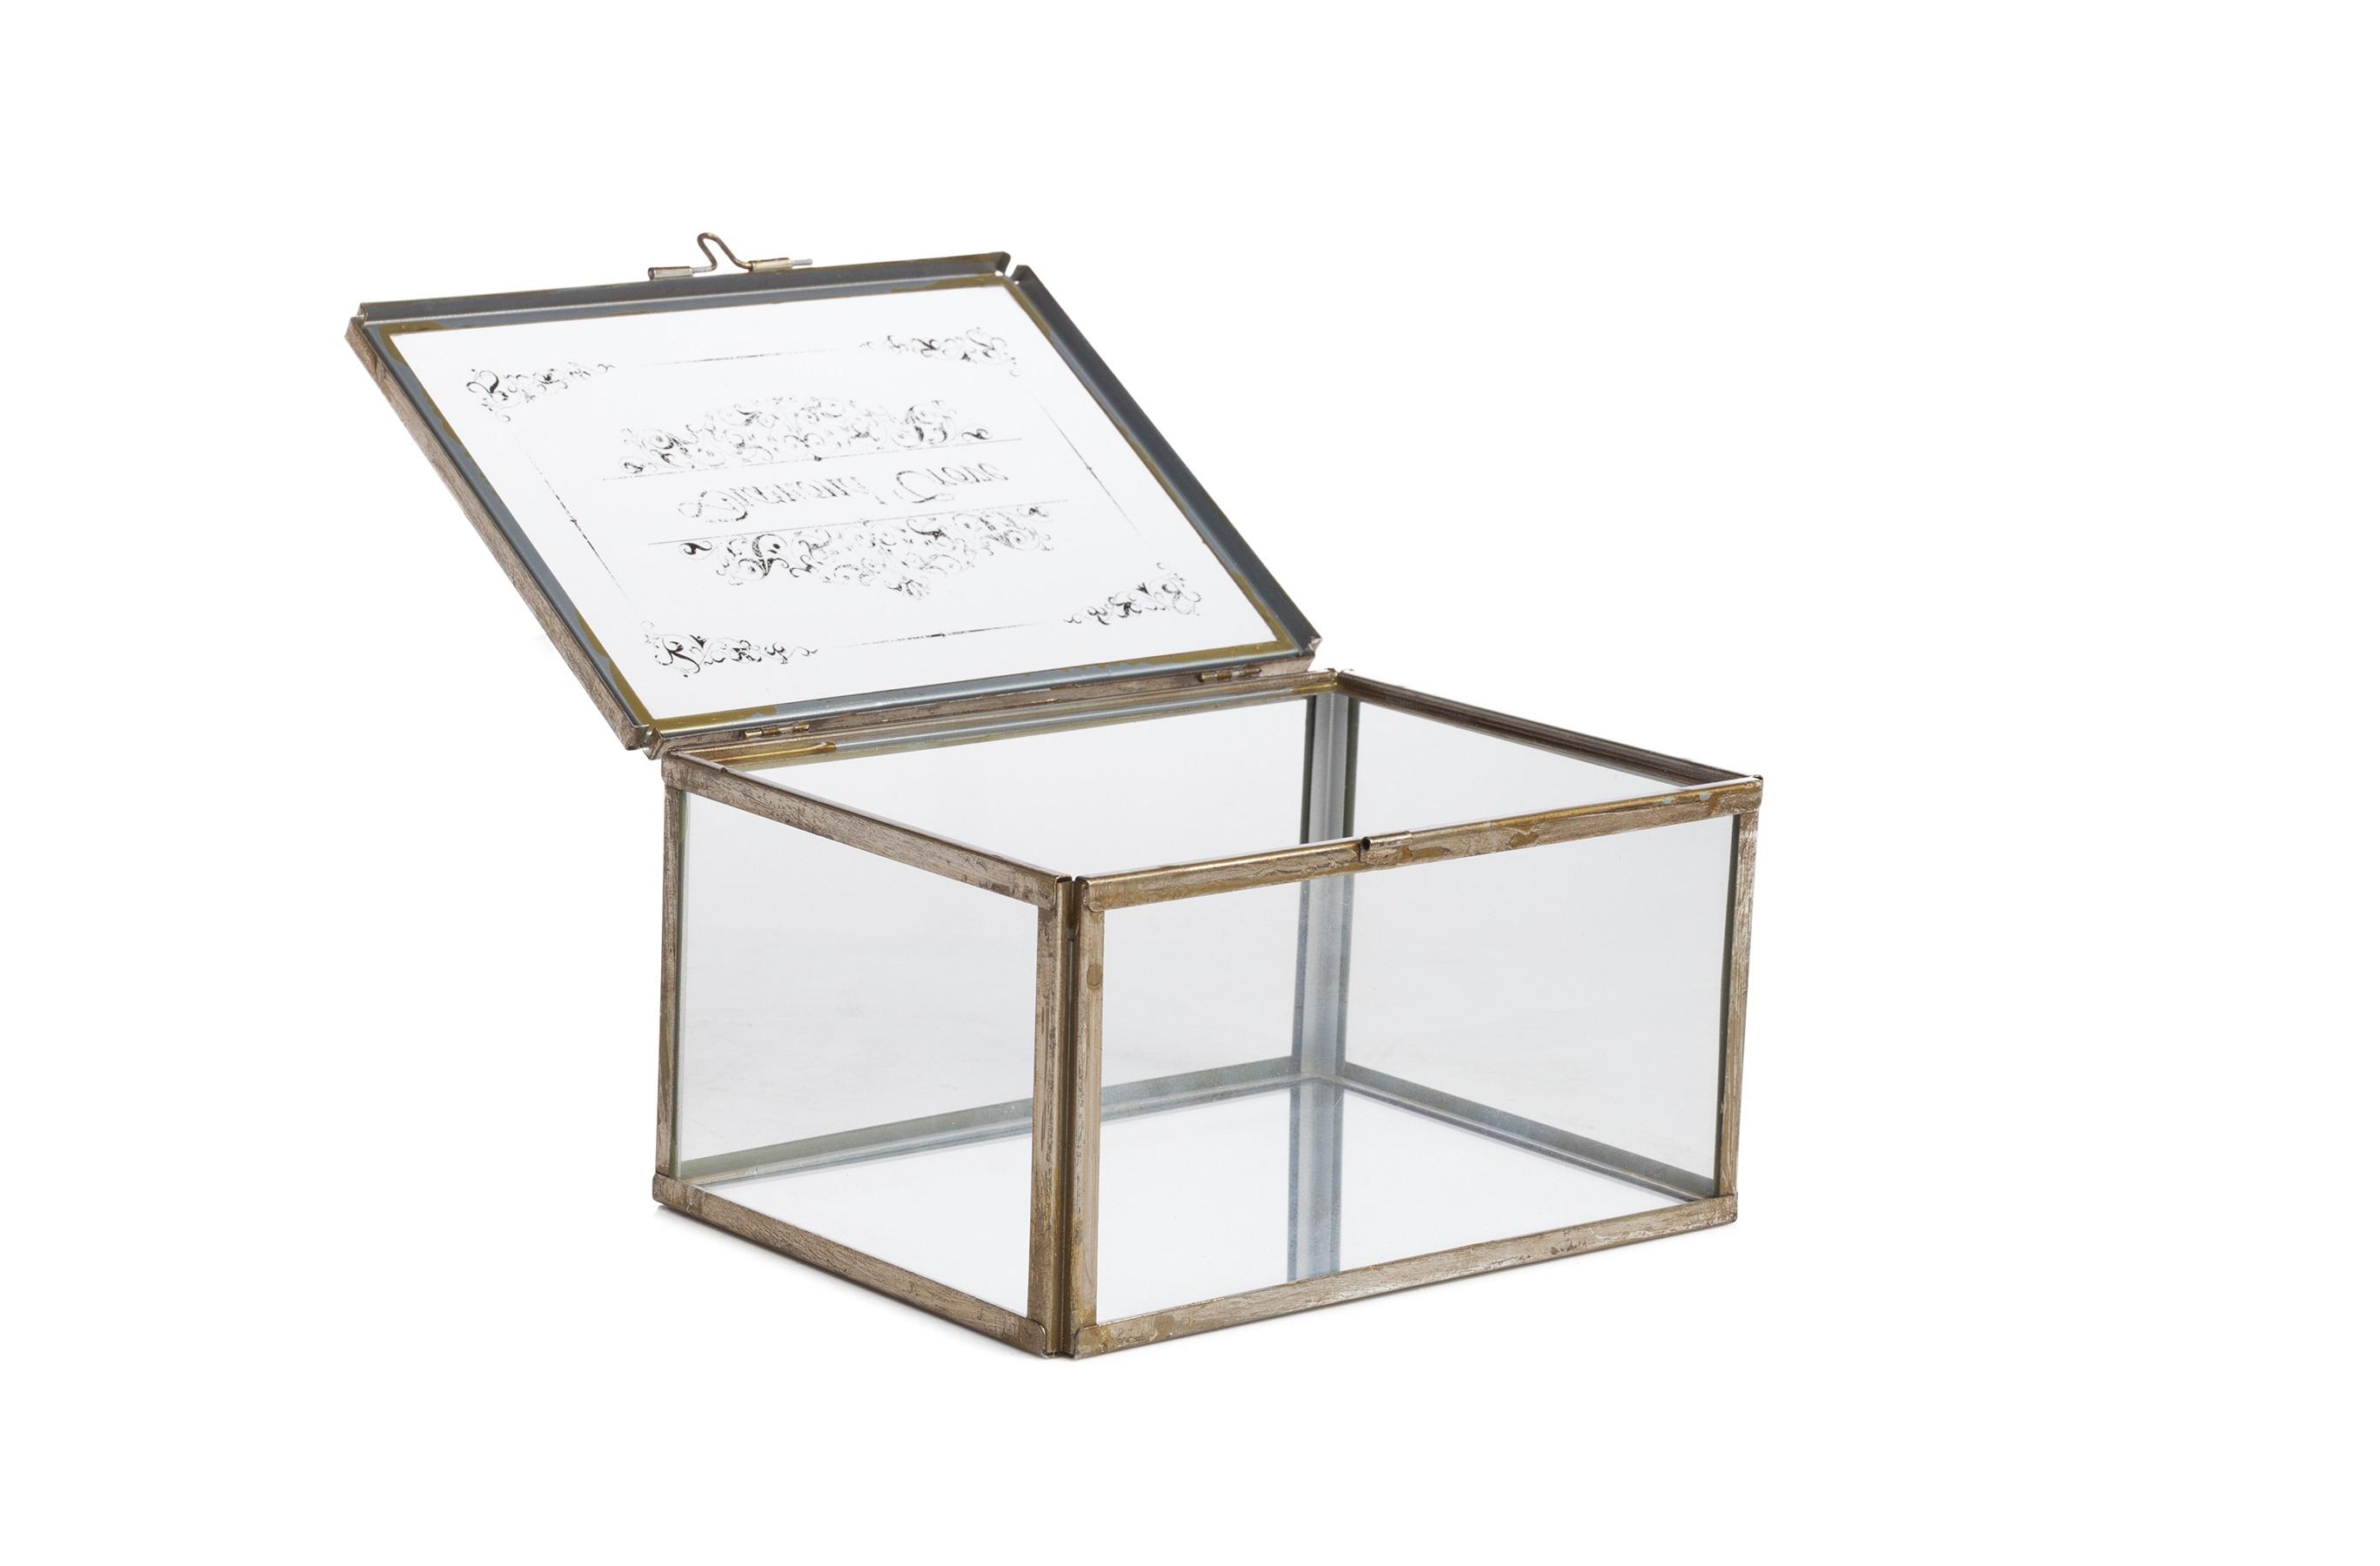 Коробка для ювелирных украшений JuneШкатулки<br><br><br>Material: Металл<br>Length см: None<br>Width см: 16,5<br>Depth см: 21,5<br>Height см: 11,5